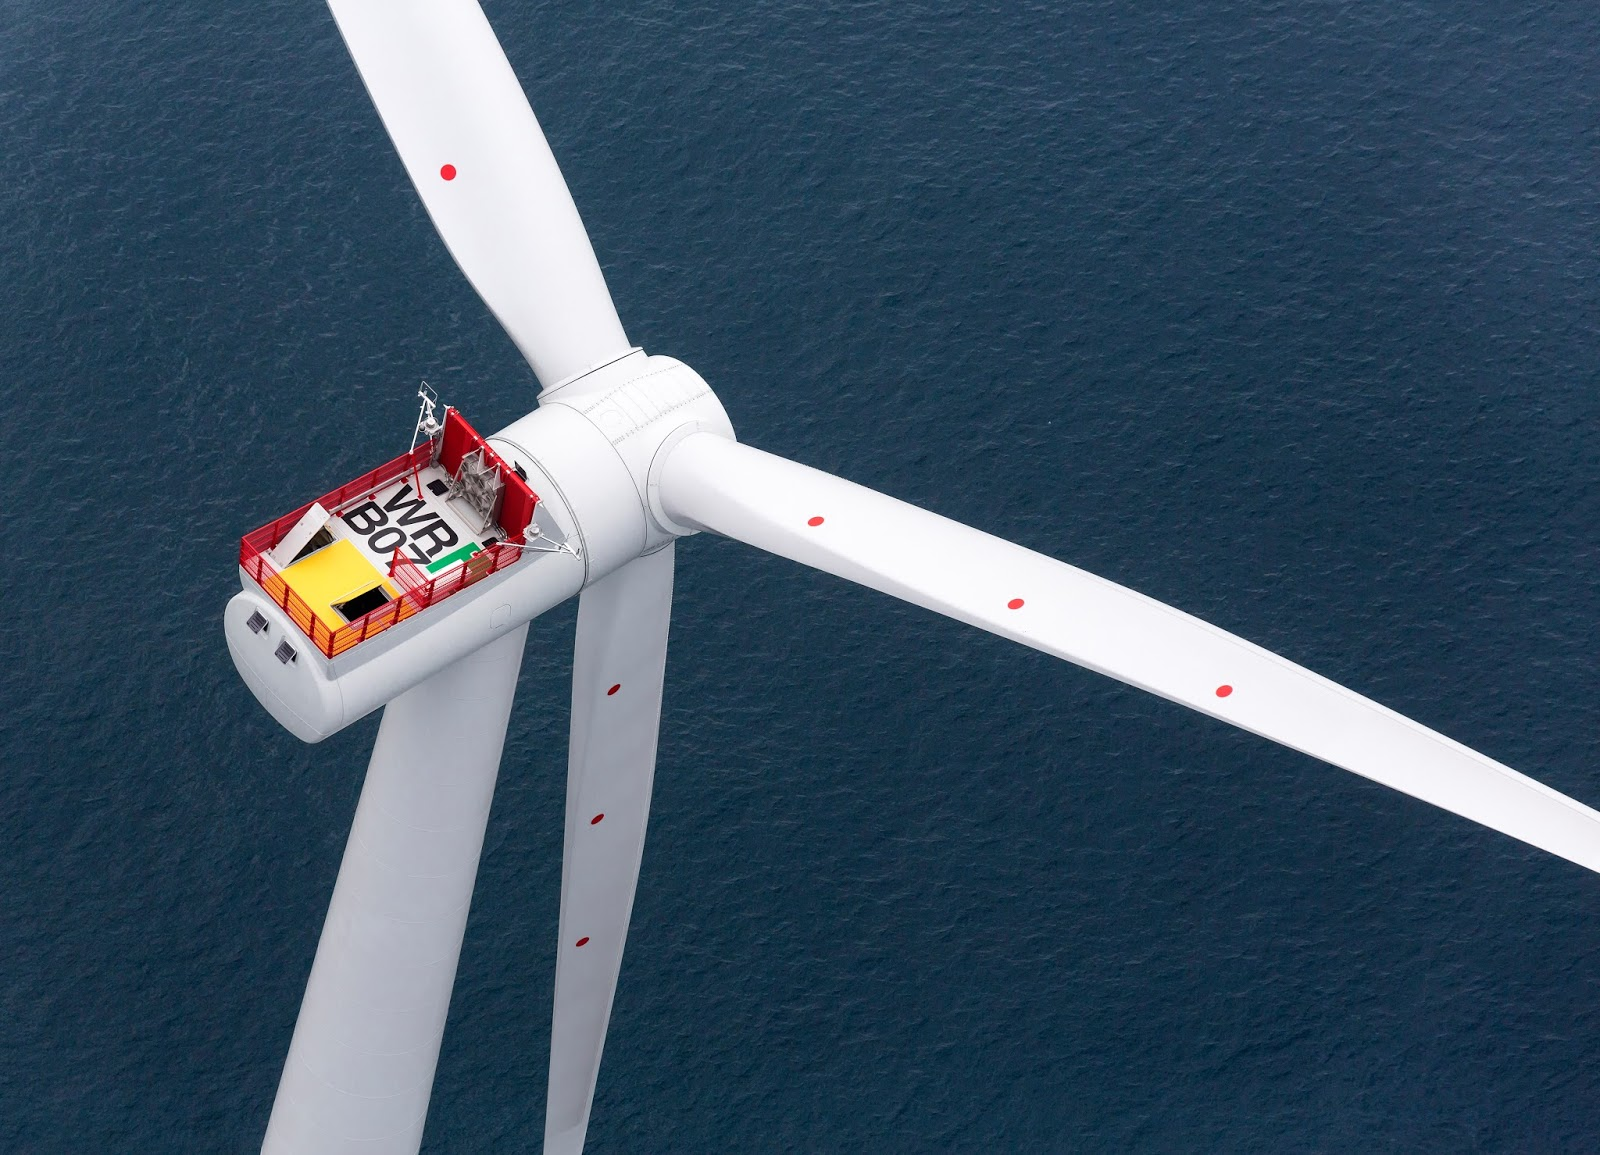 wind energy technician